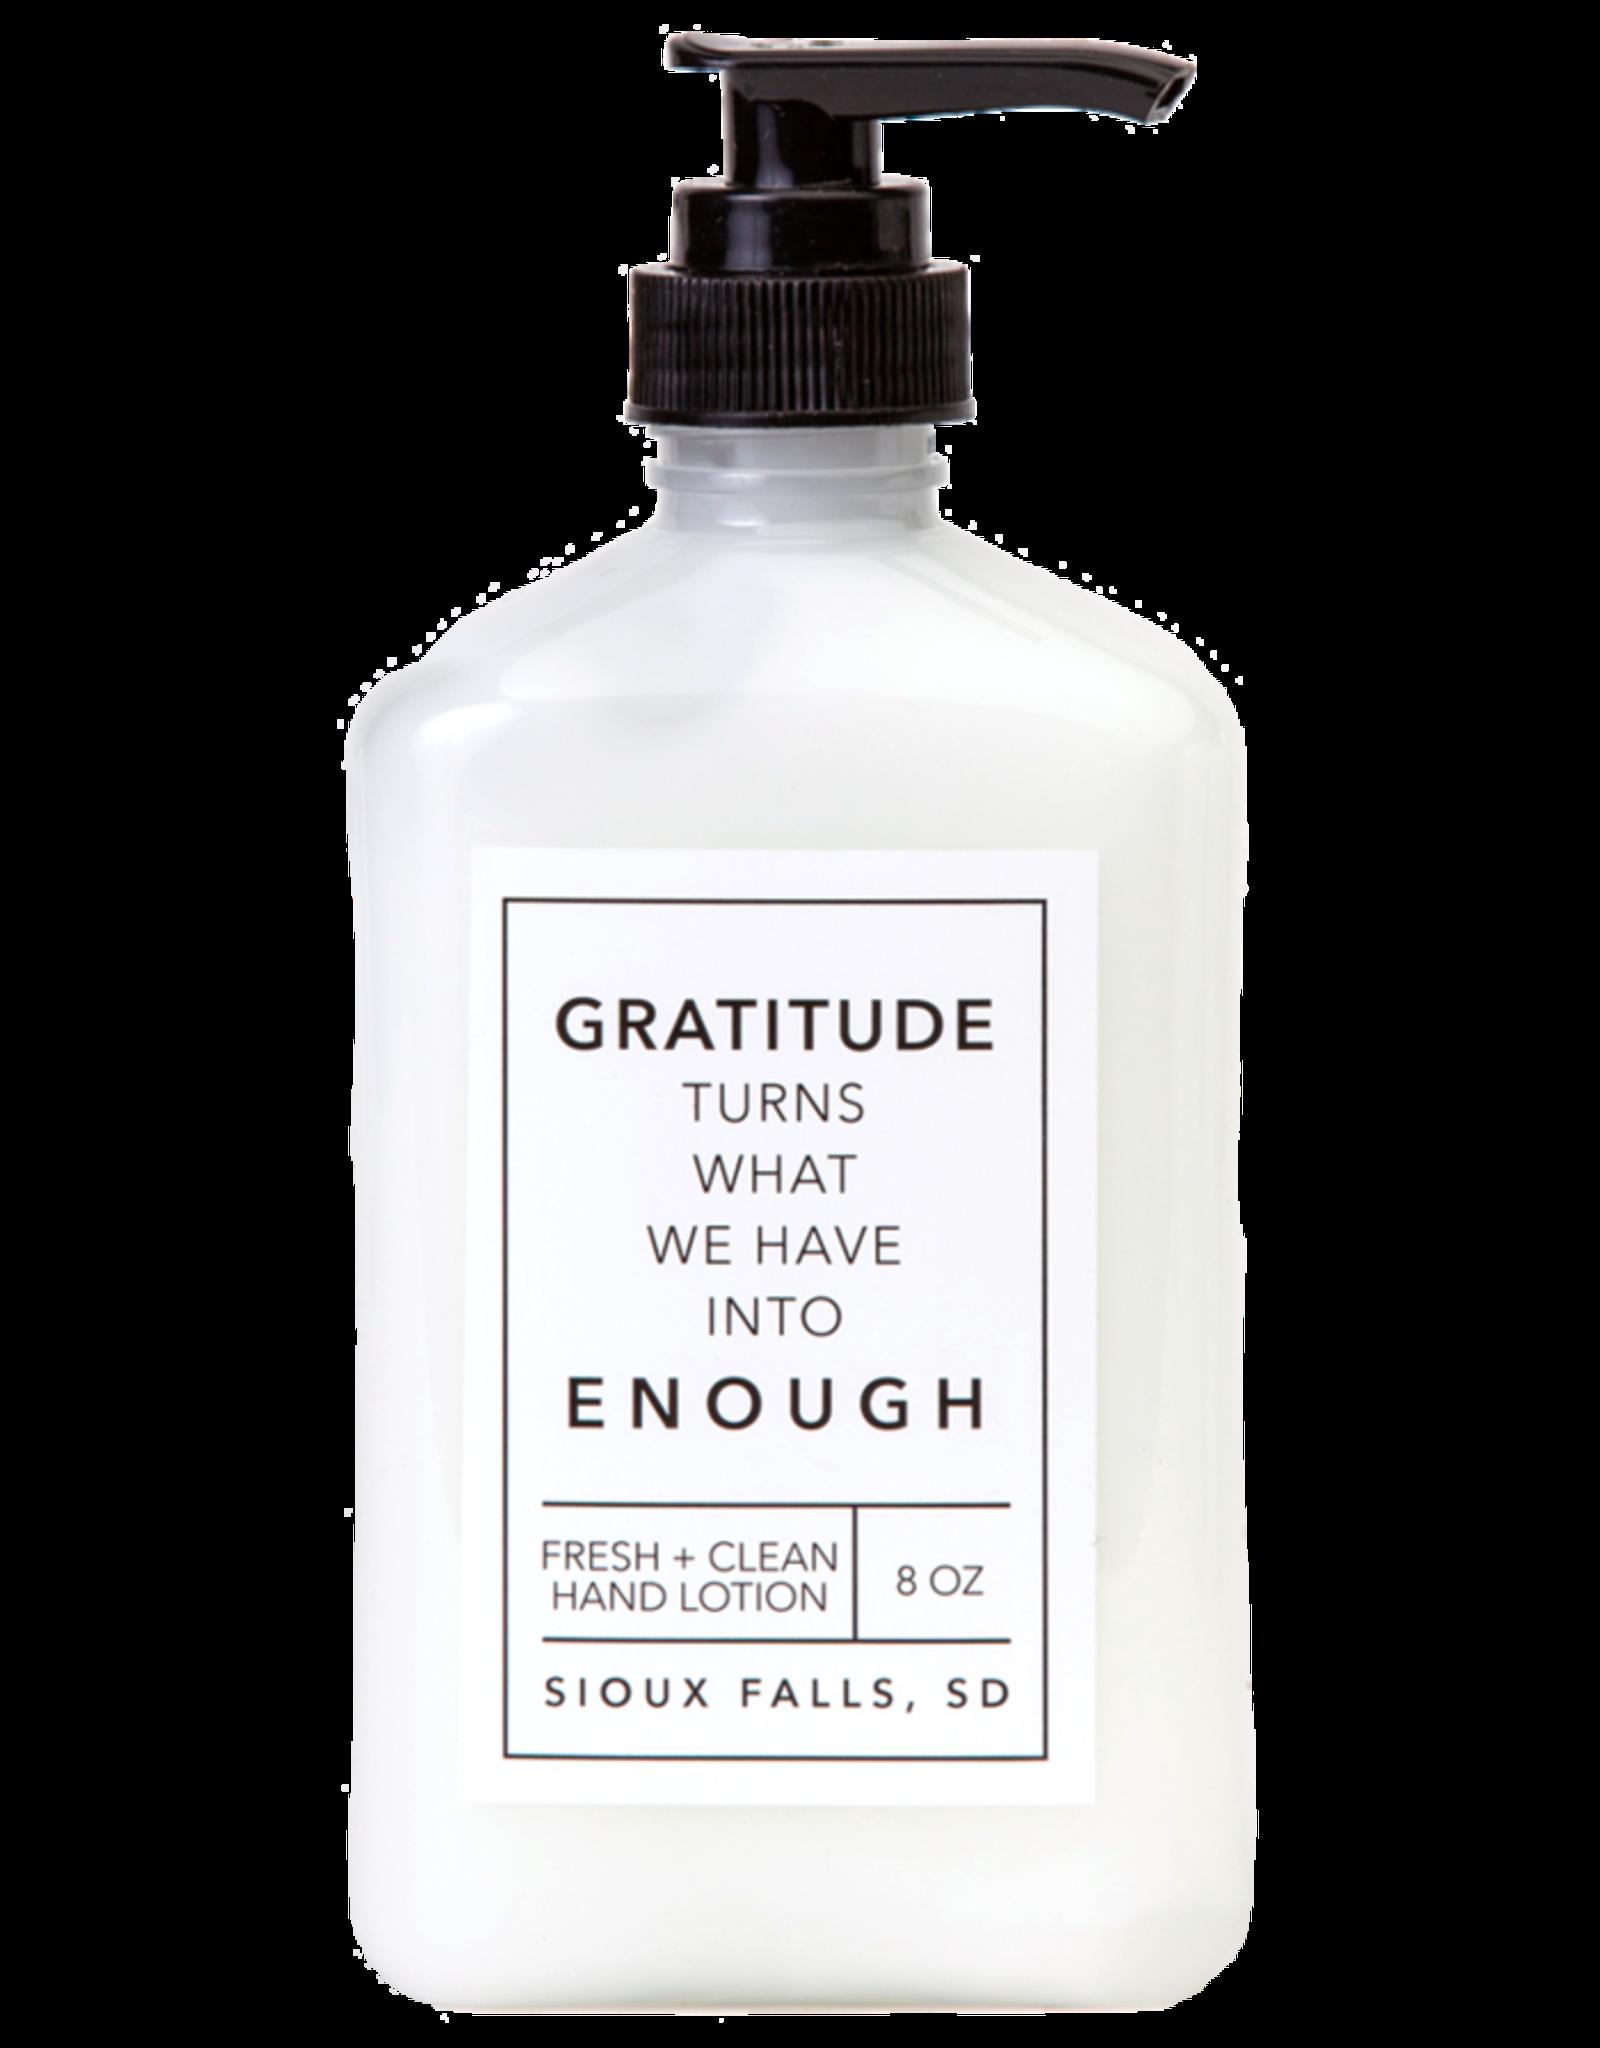 - Gratitude 8oz Hand Lotion